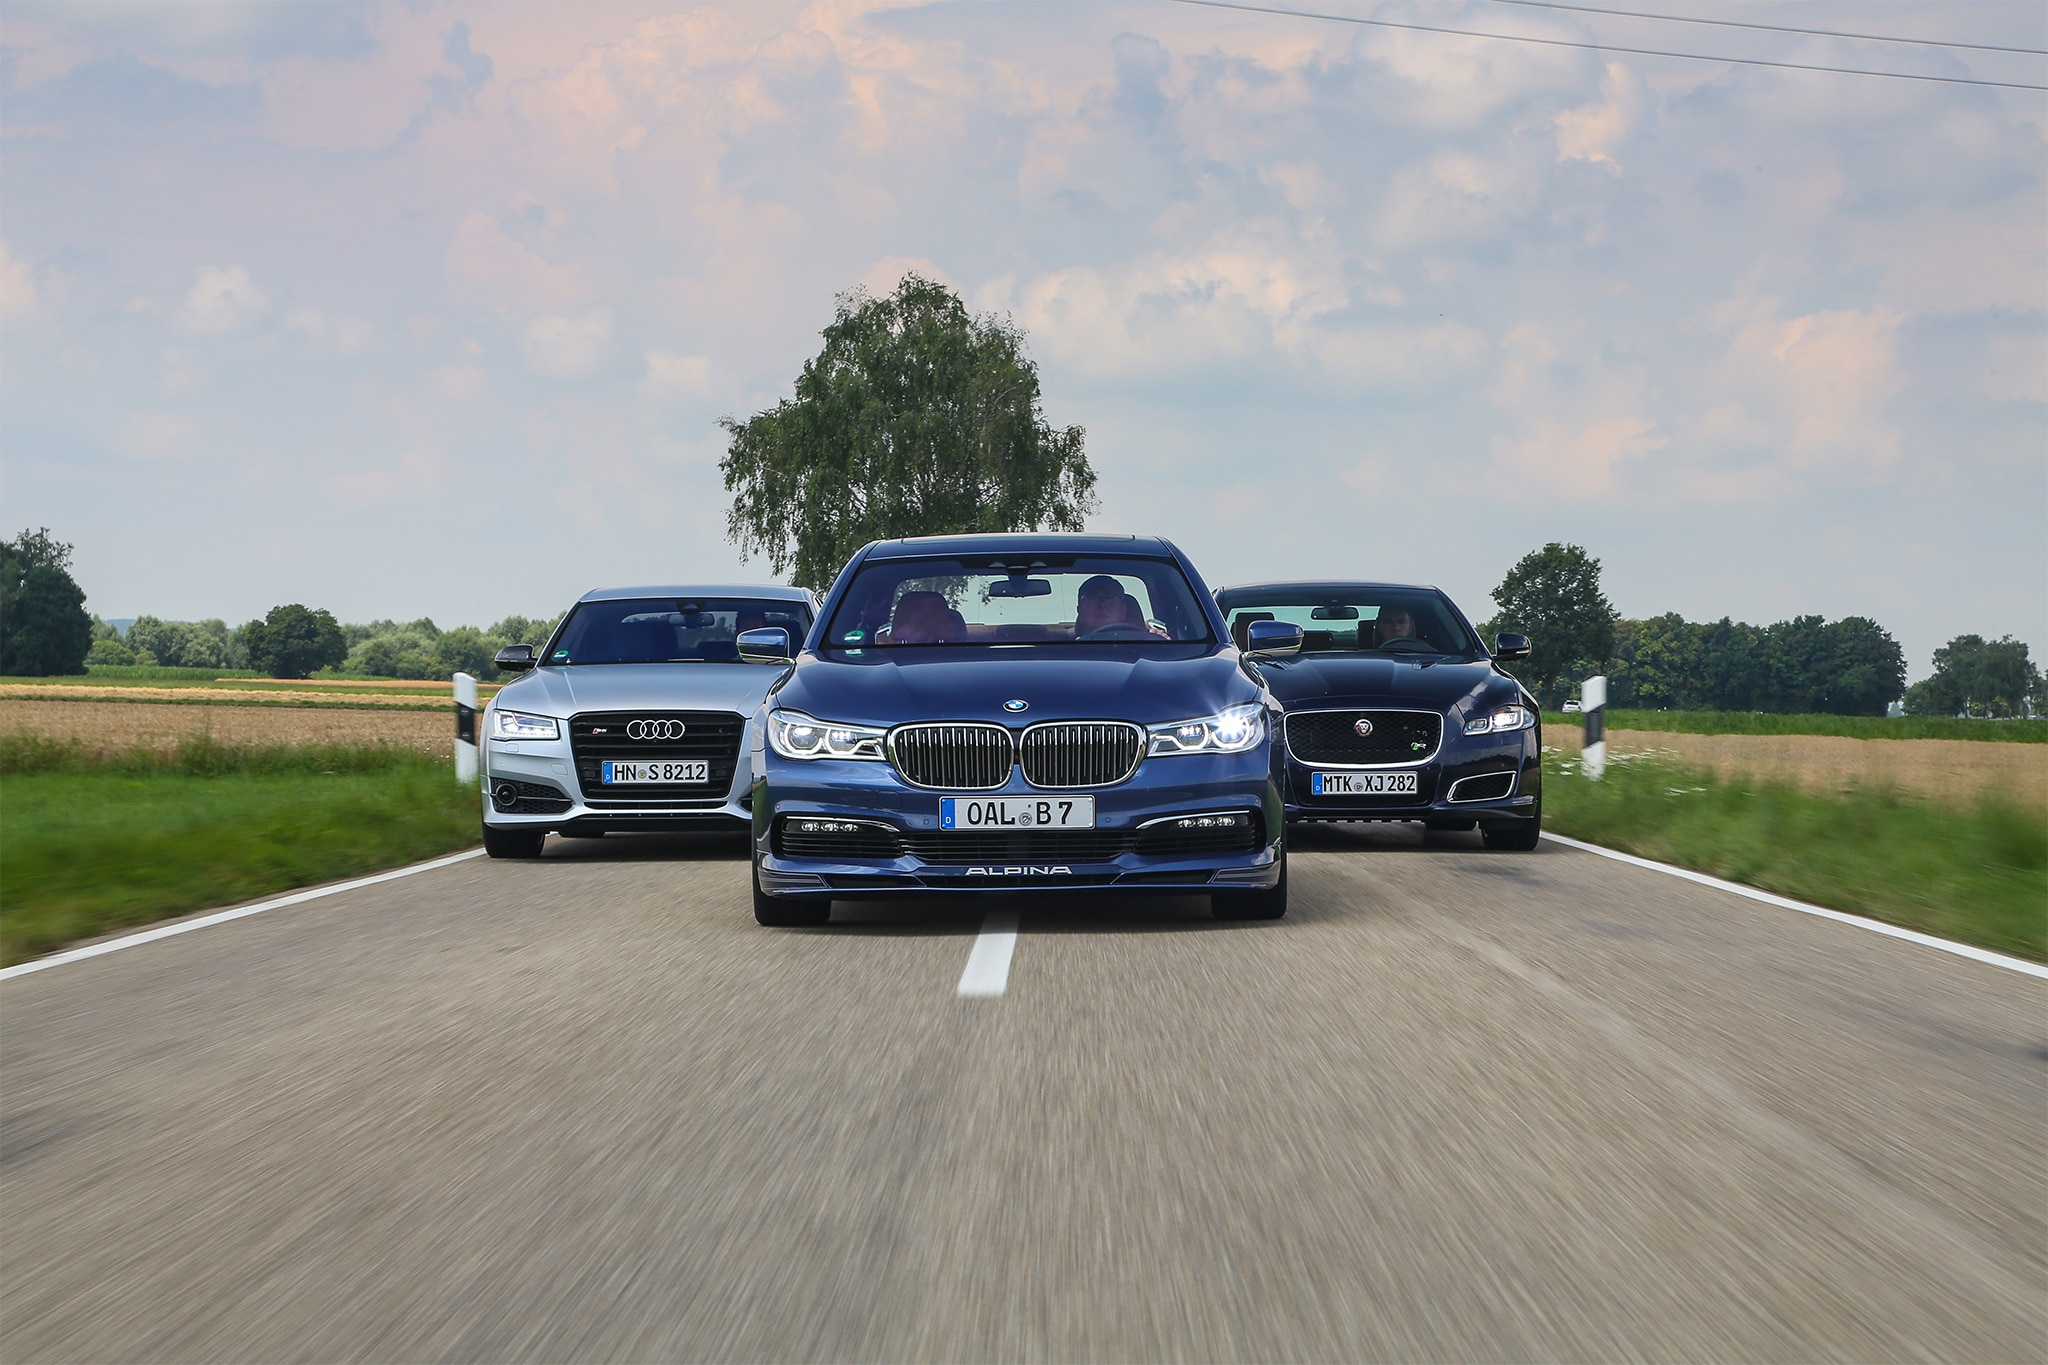 2017 BMW Alpina B7 XDrive Vs Audi S8 Plus 2016 Jaguar